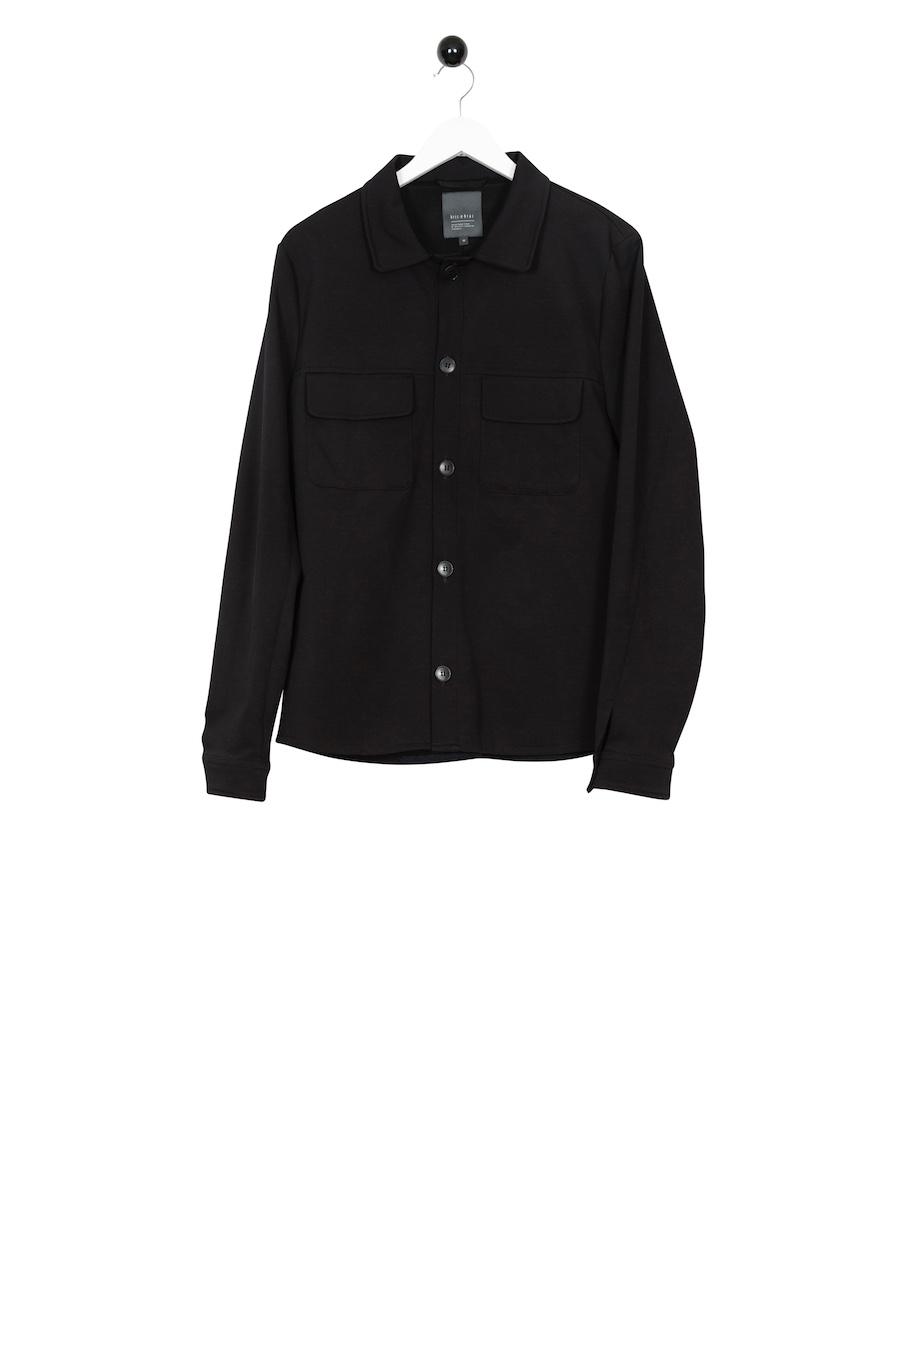 Obsidian Jacket